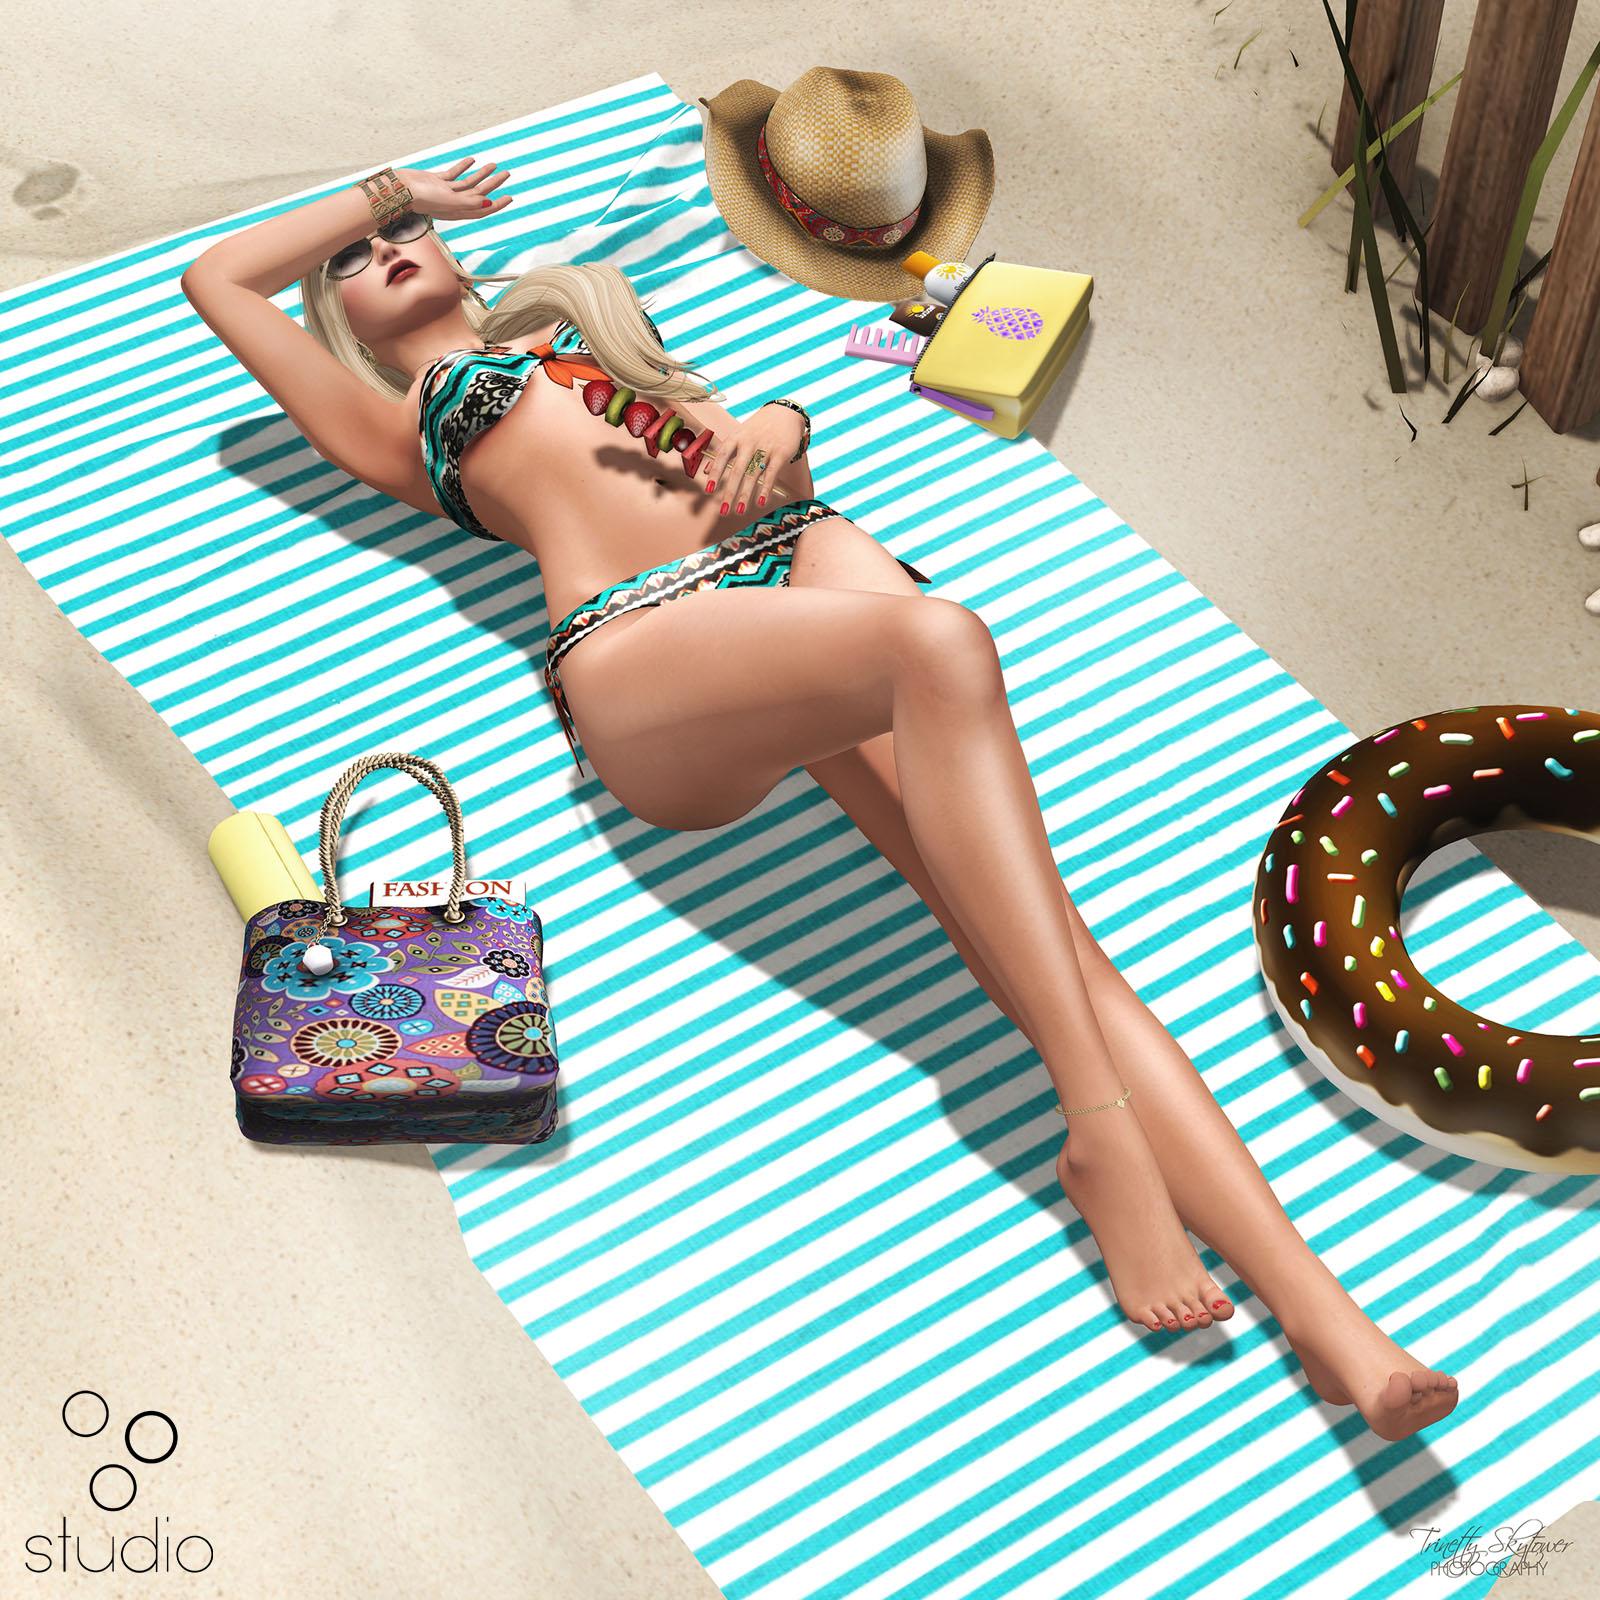 oOo Studio: Sunning